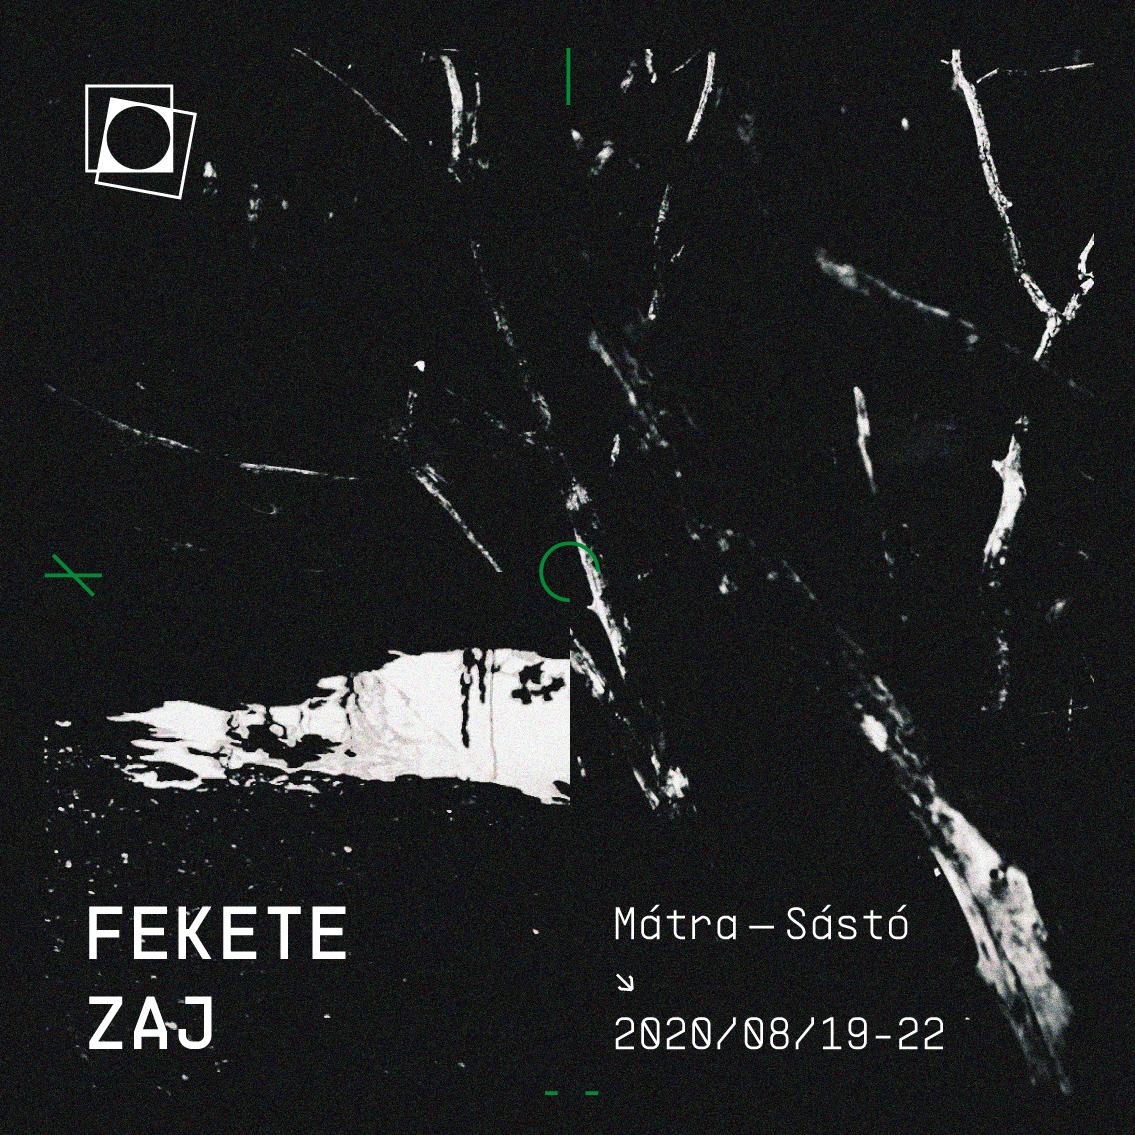 fz2020-square_fesztival.jpg